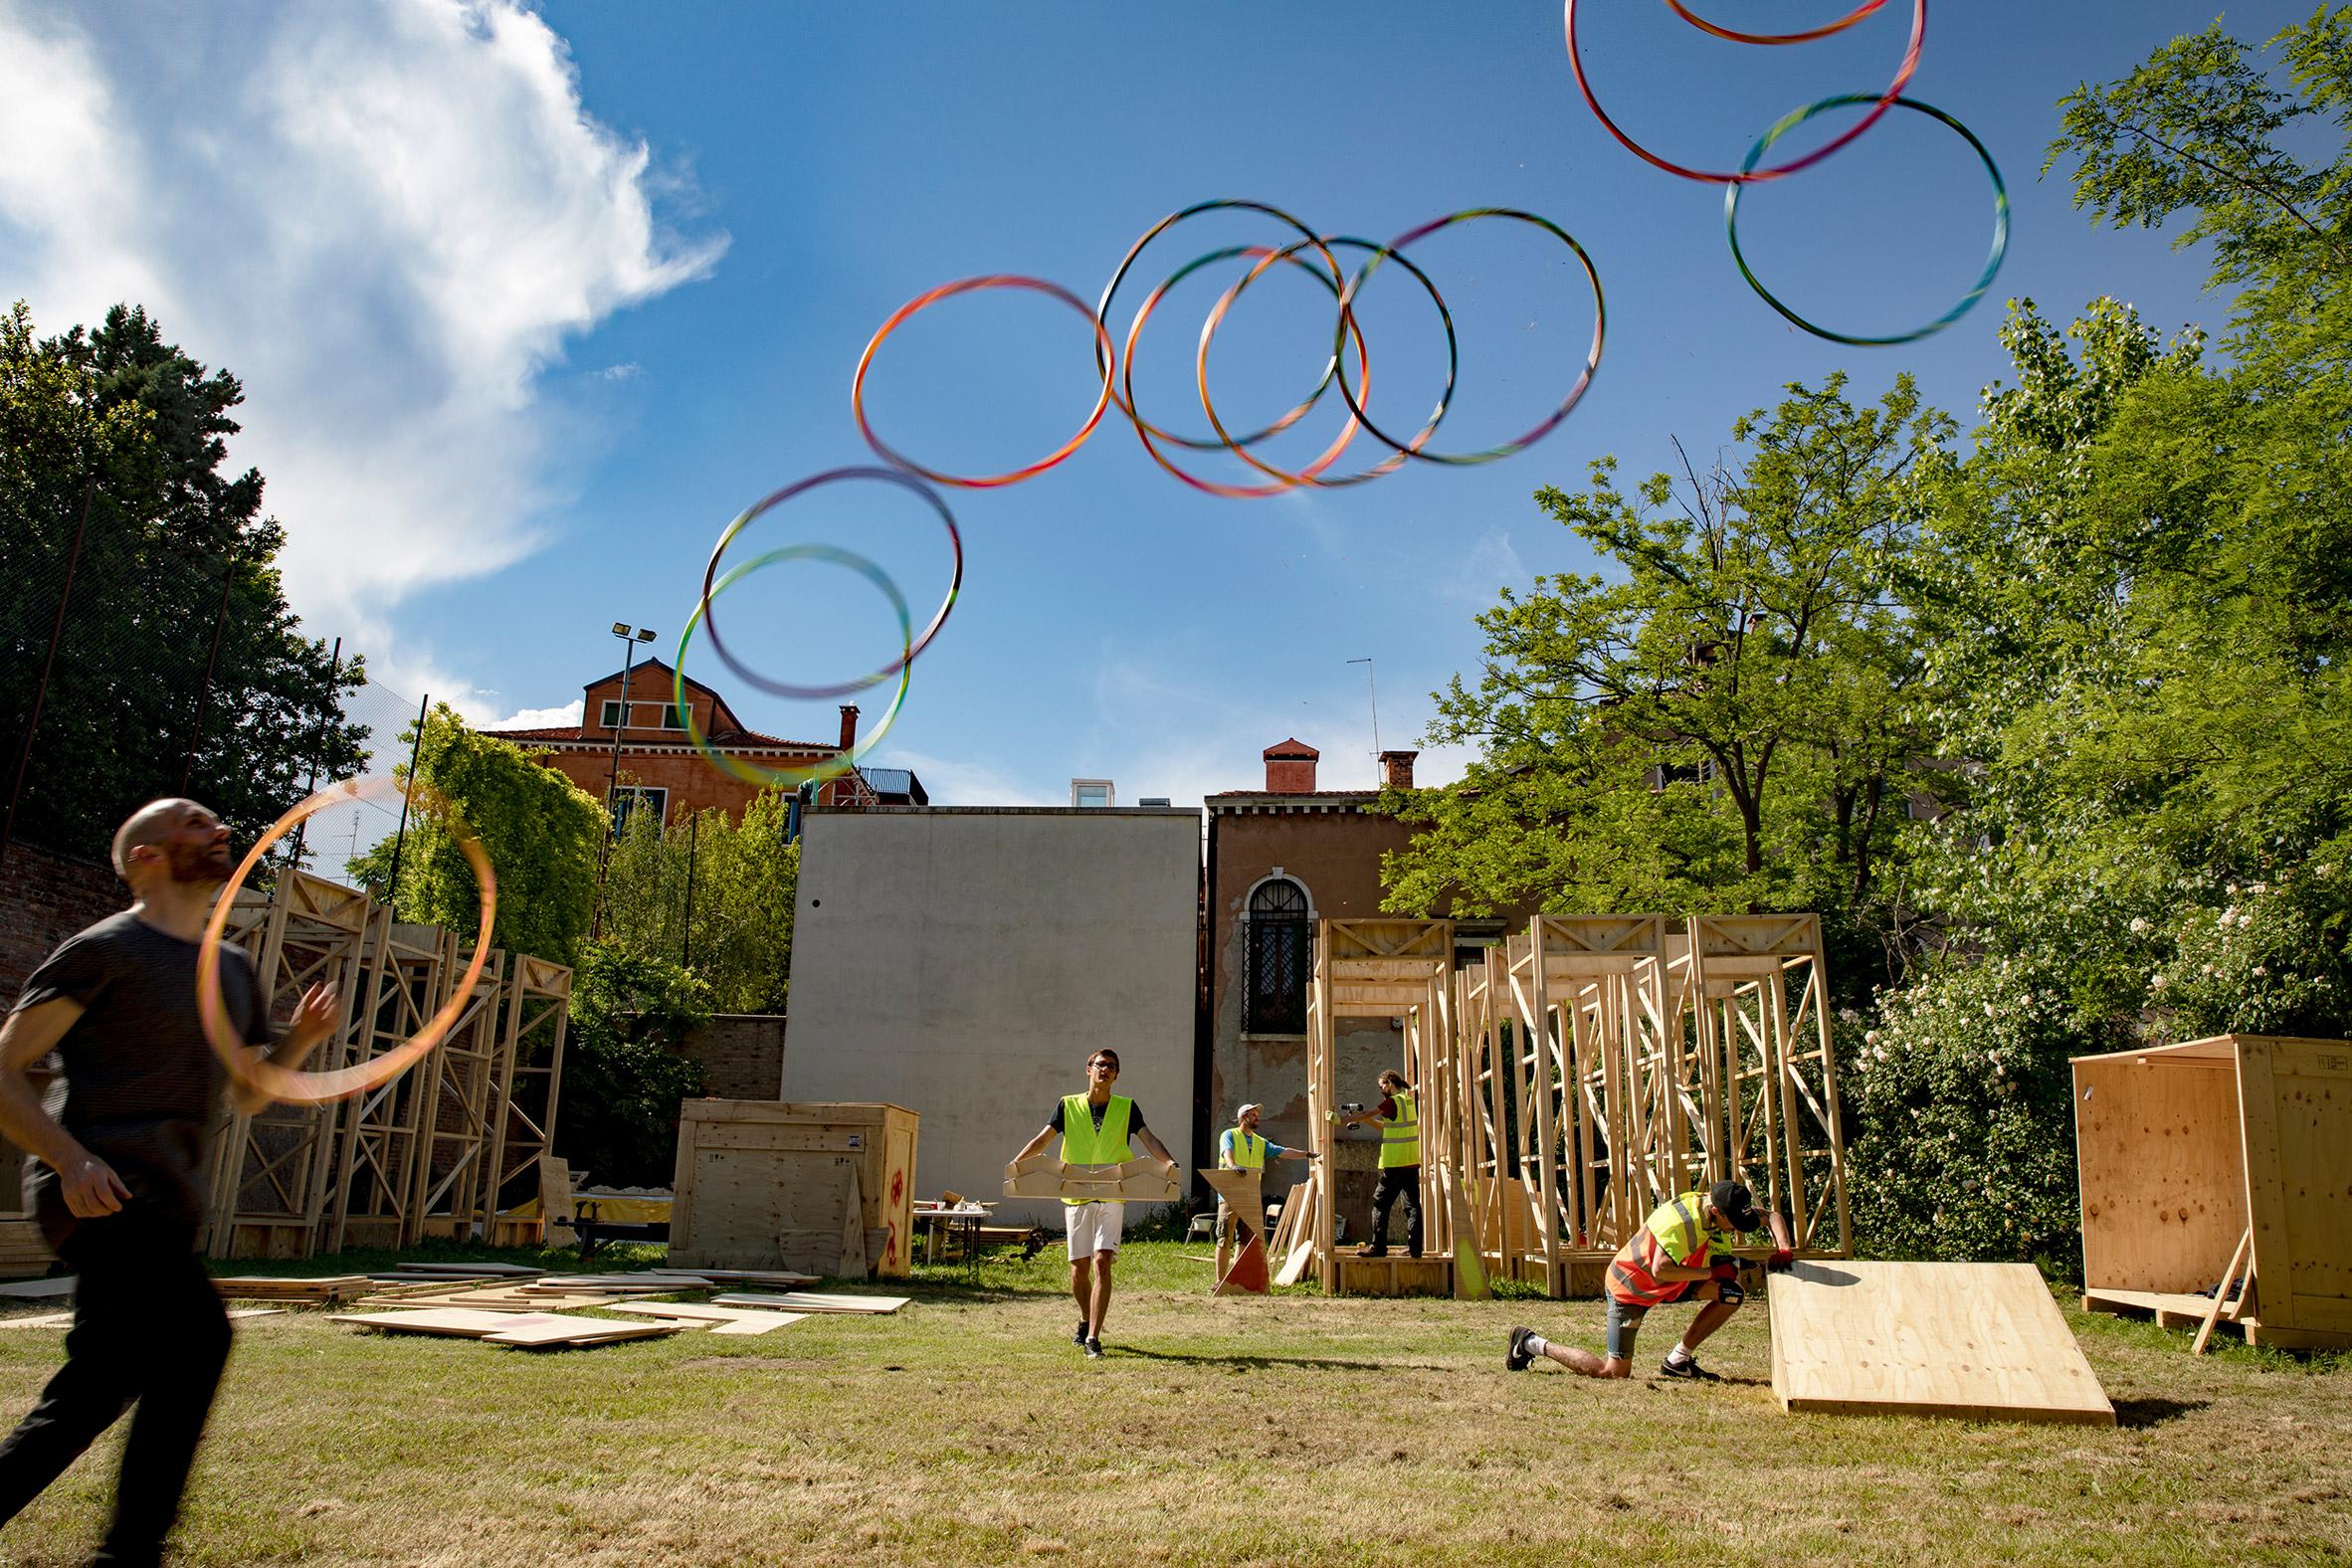 Baxendale Venice Biennale installation, photo by Basharat Khan